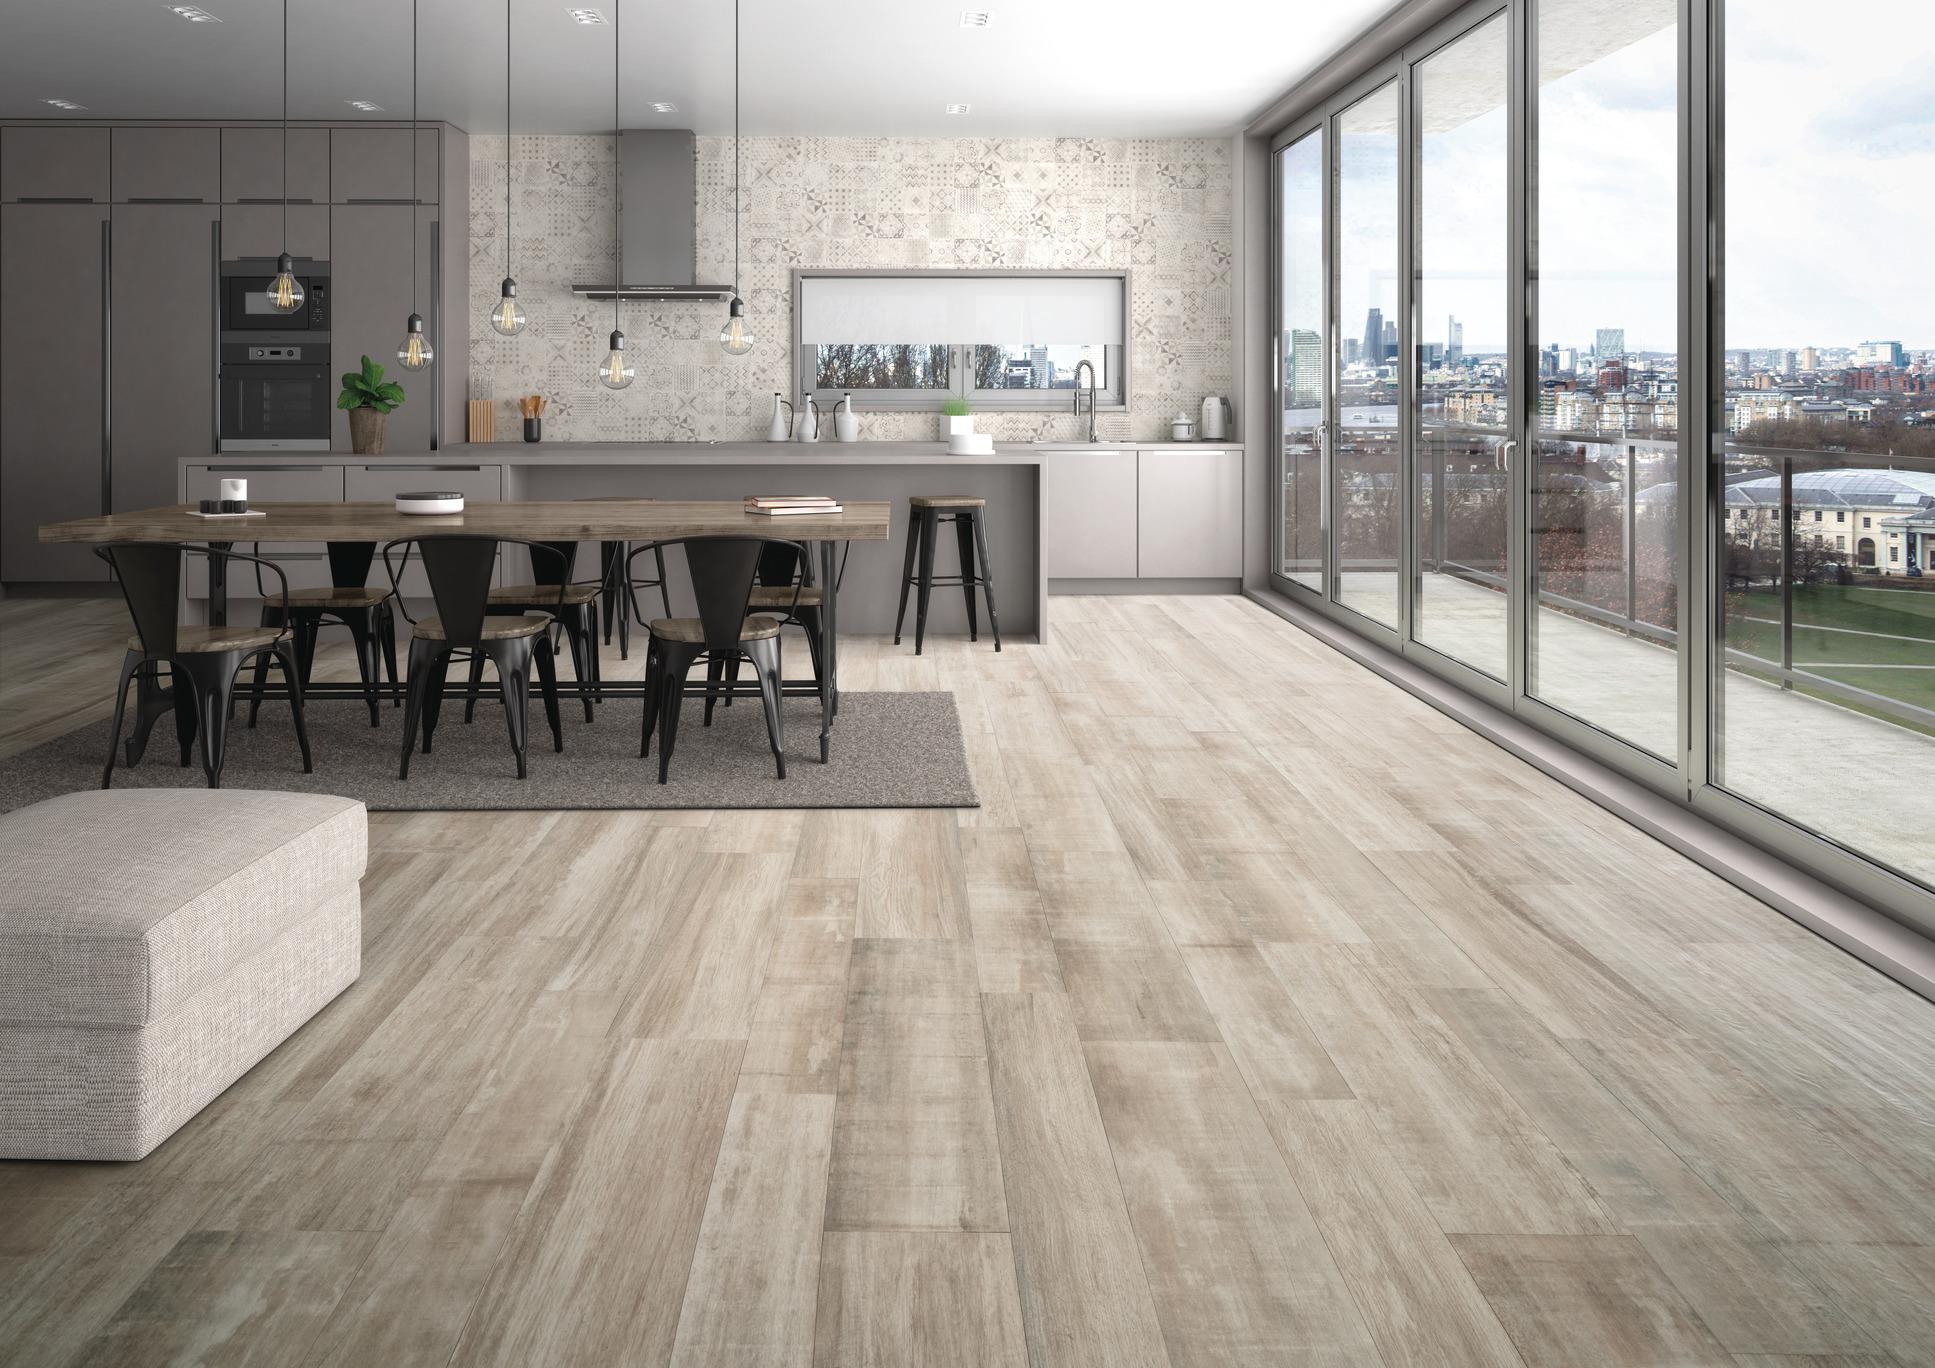 dlažba-a-obklad-do-kuchyne-v-dekoru-dreva-matna-22x90-lumber